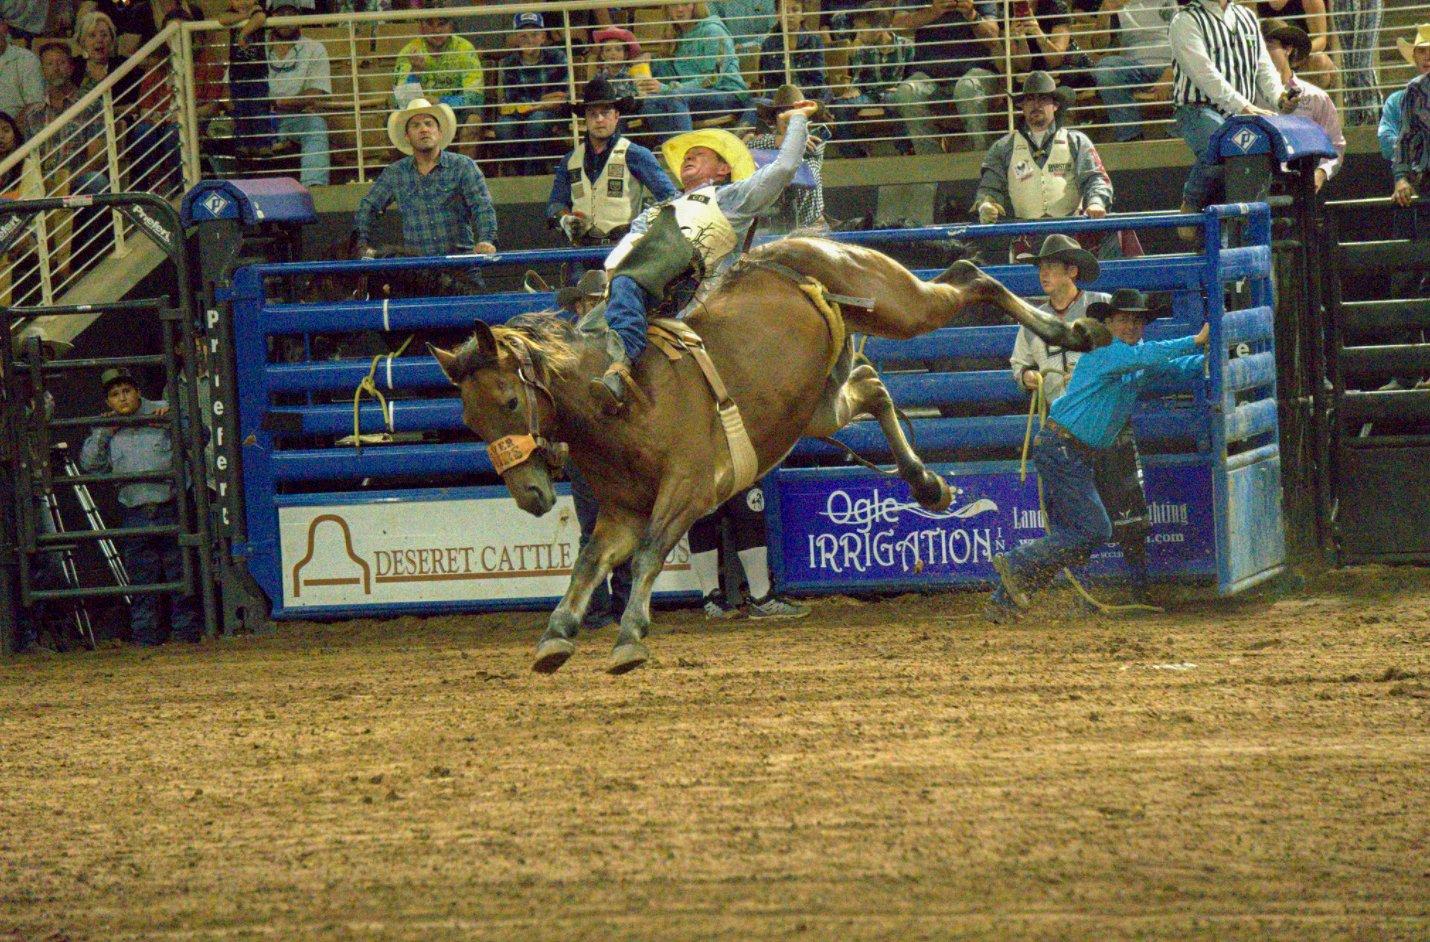 Brown bucking horse in an in-door arena with bareback rider